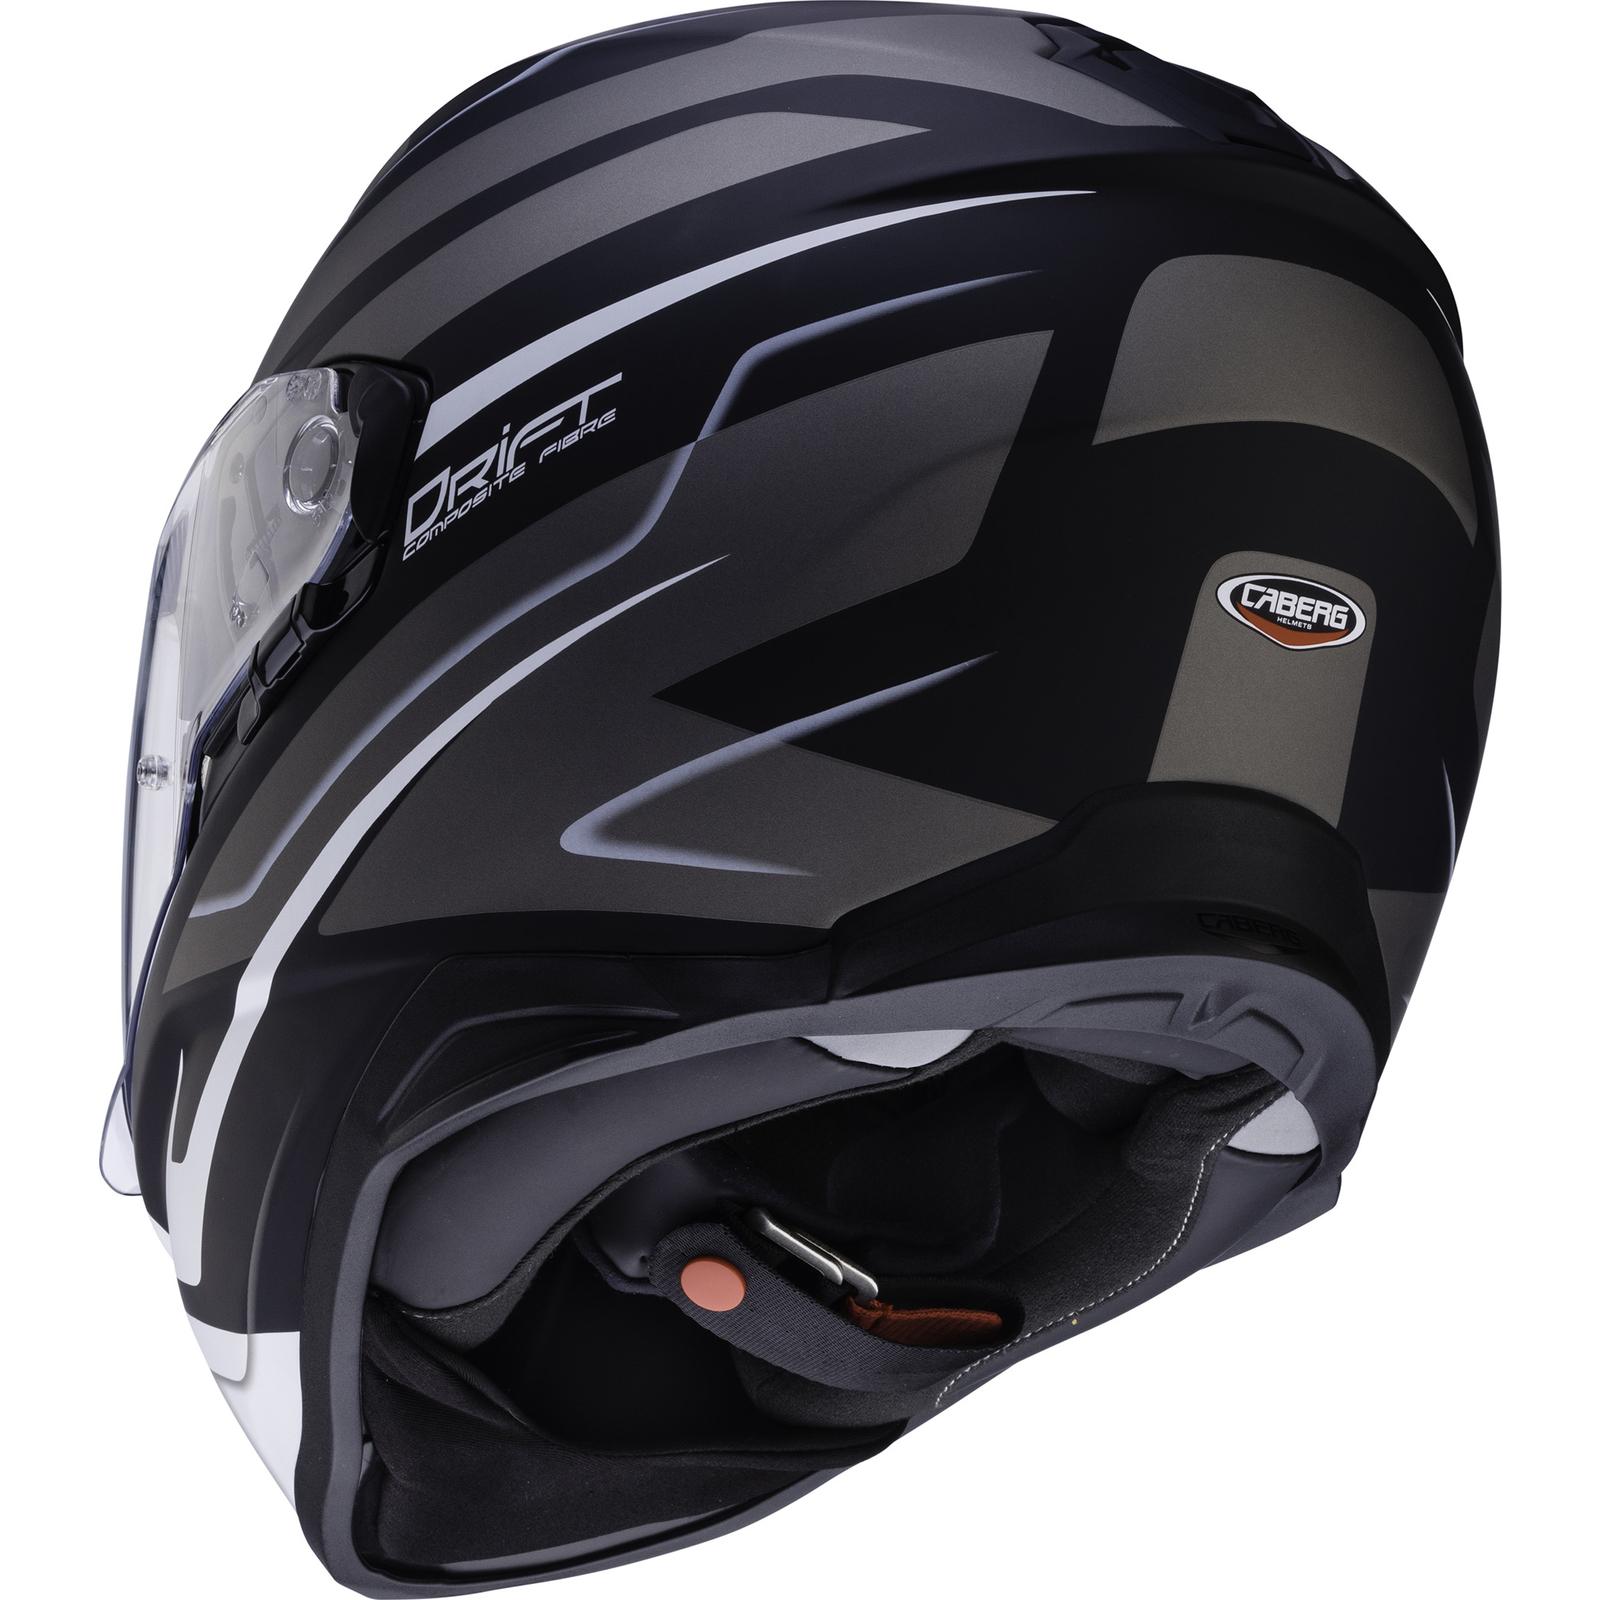 6712f494 Caberg Drift Shadow Matt Black White Anthracite Motorcycle Helmet ...